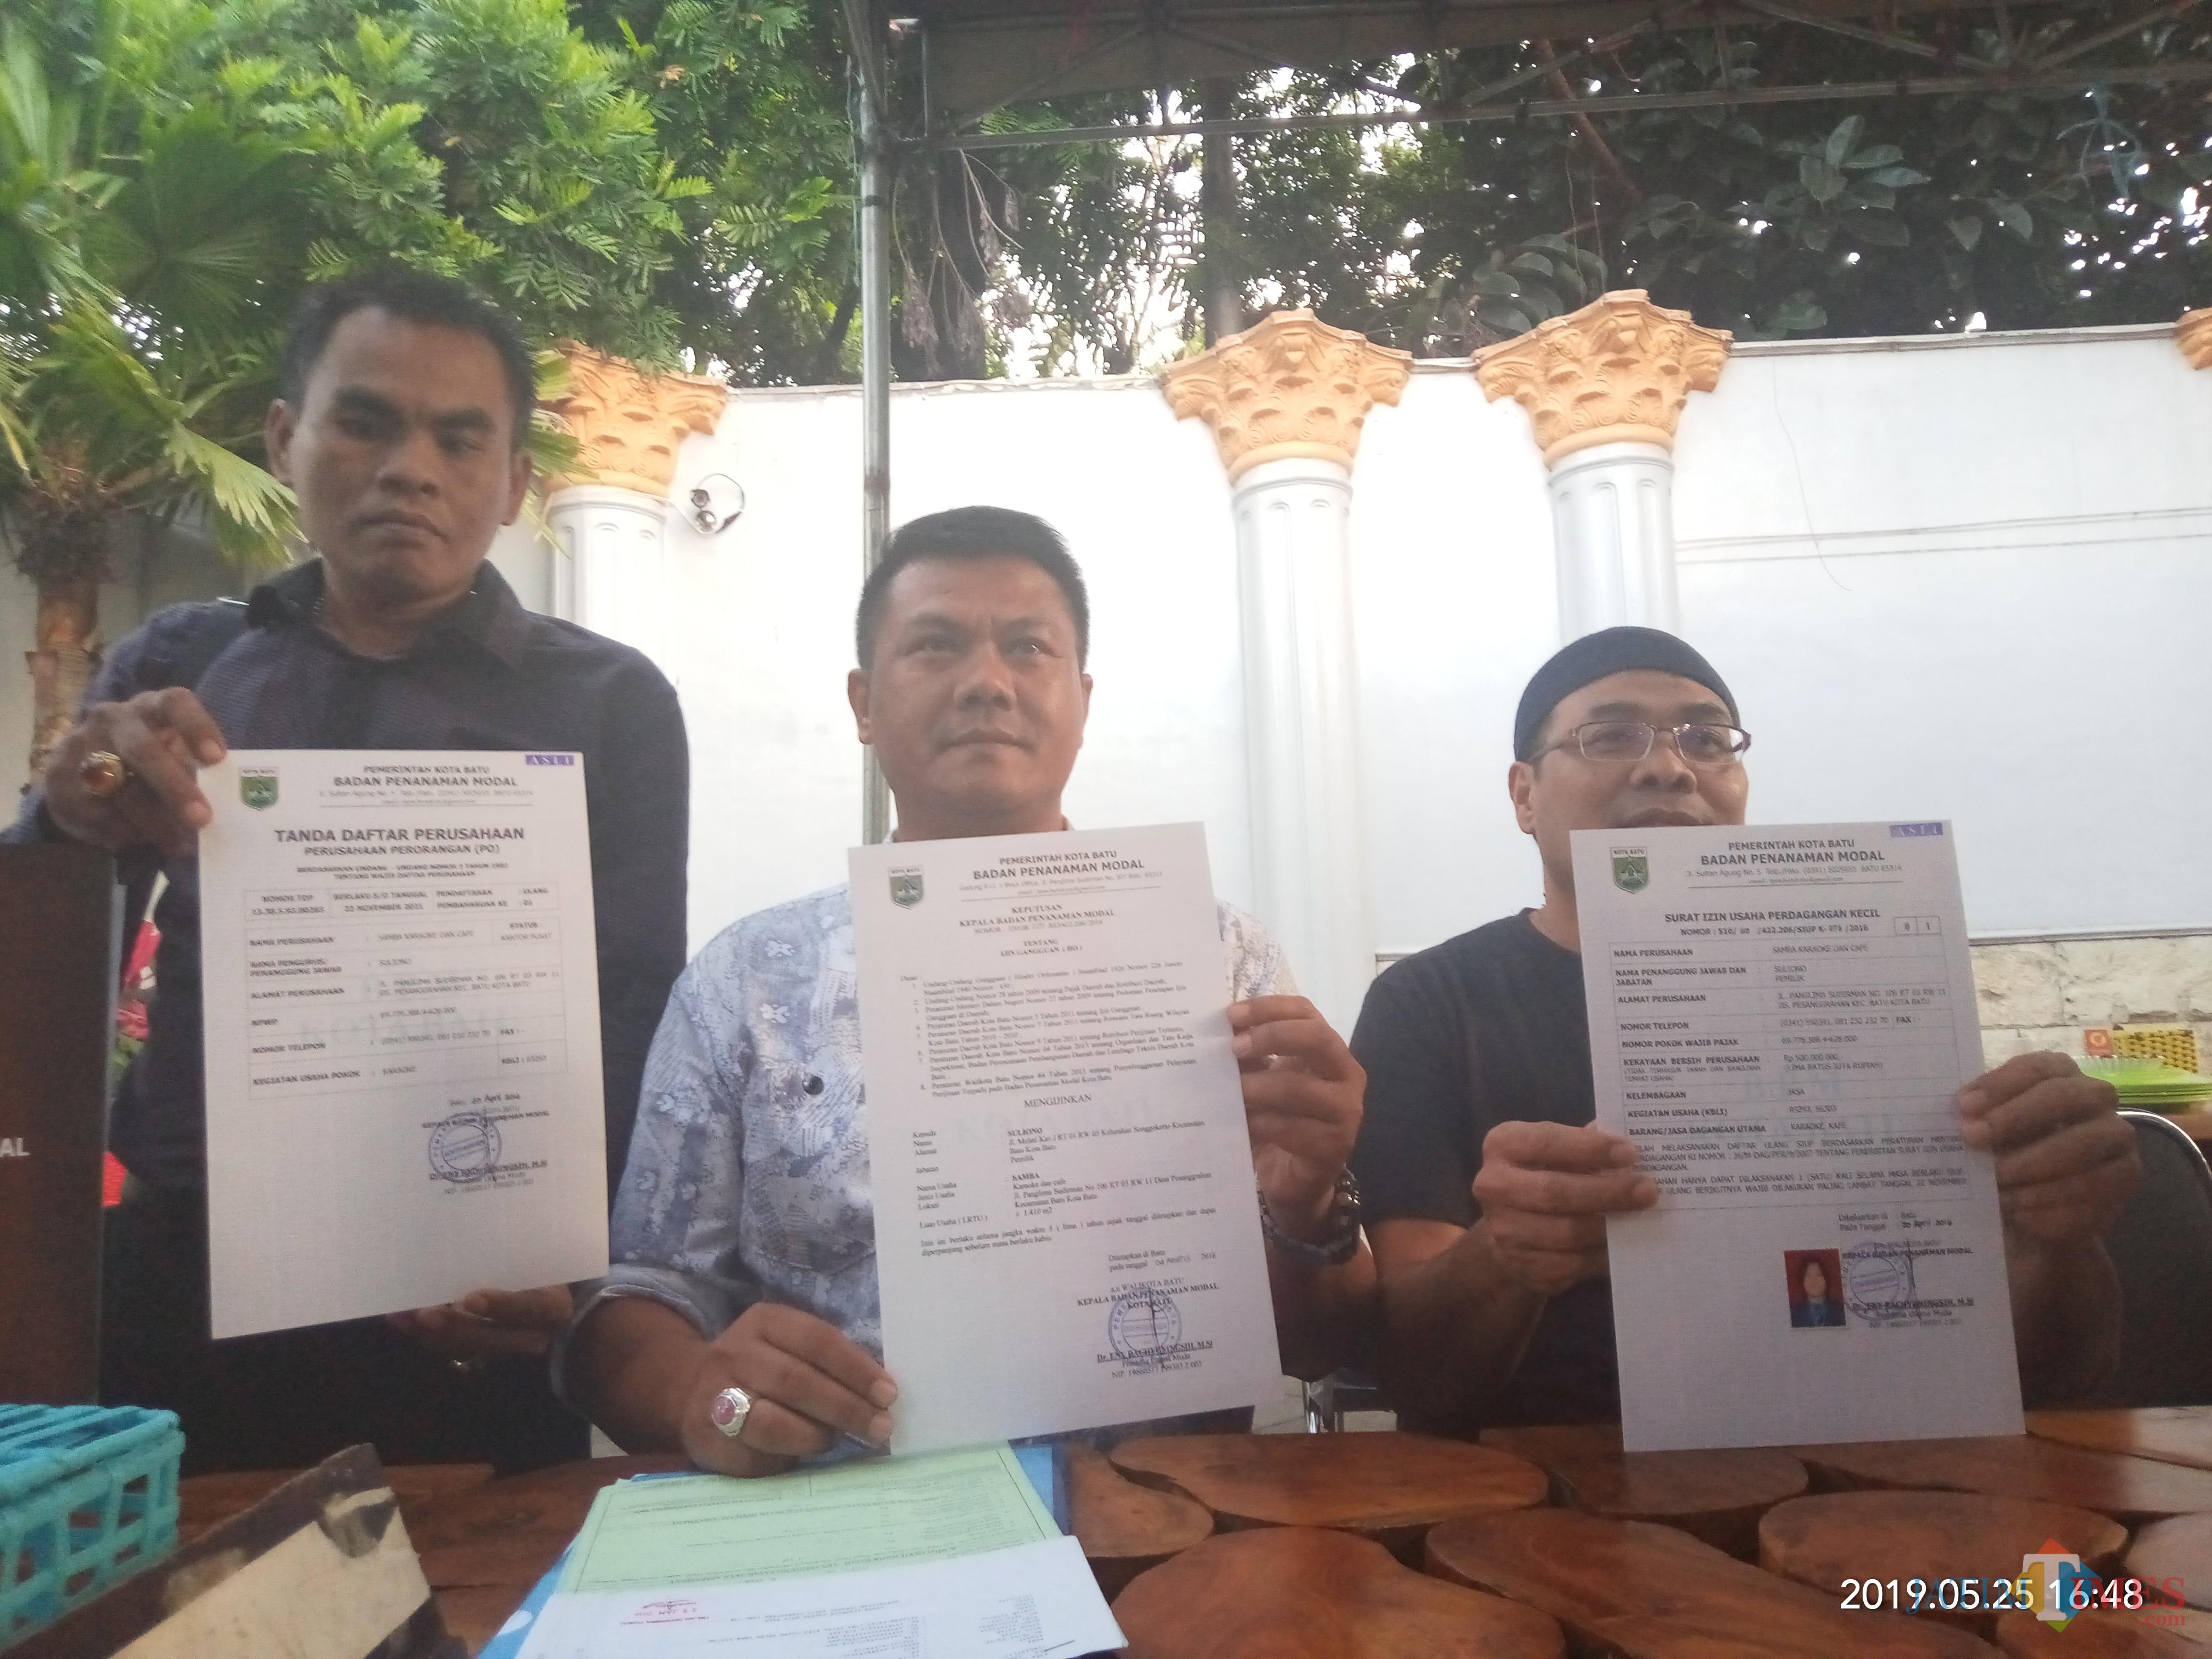 Sumardhan (paling kanan) saat menunjukan beberapa bukti perizinan usaha karaoke Samba. (Anggara Sudiongko/MalangTIMES)